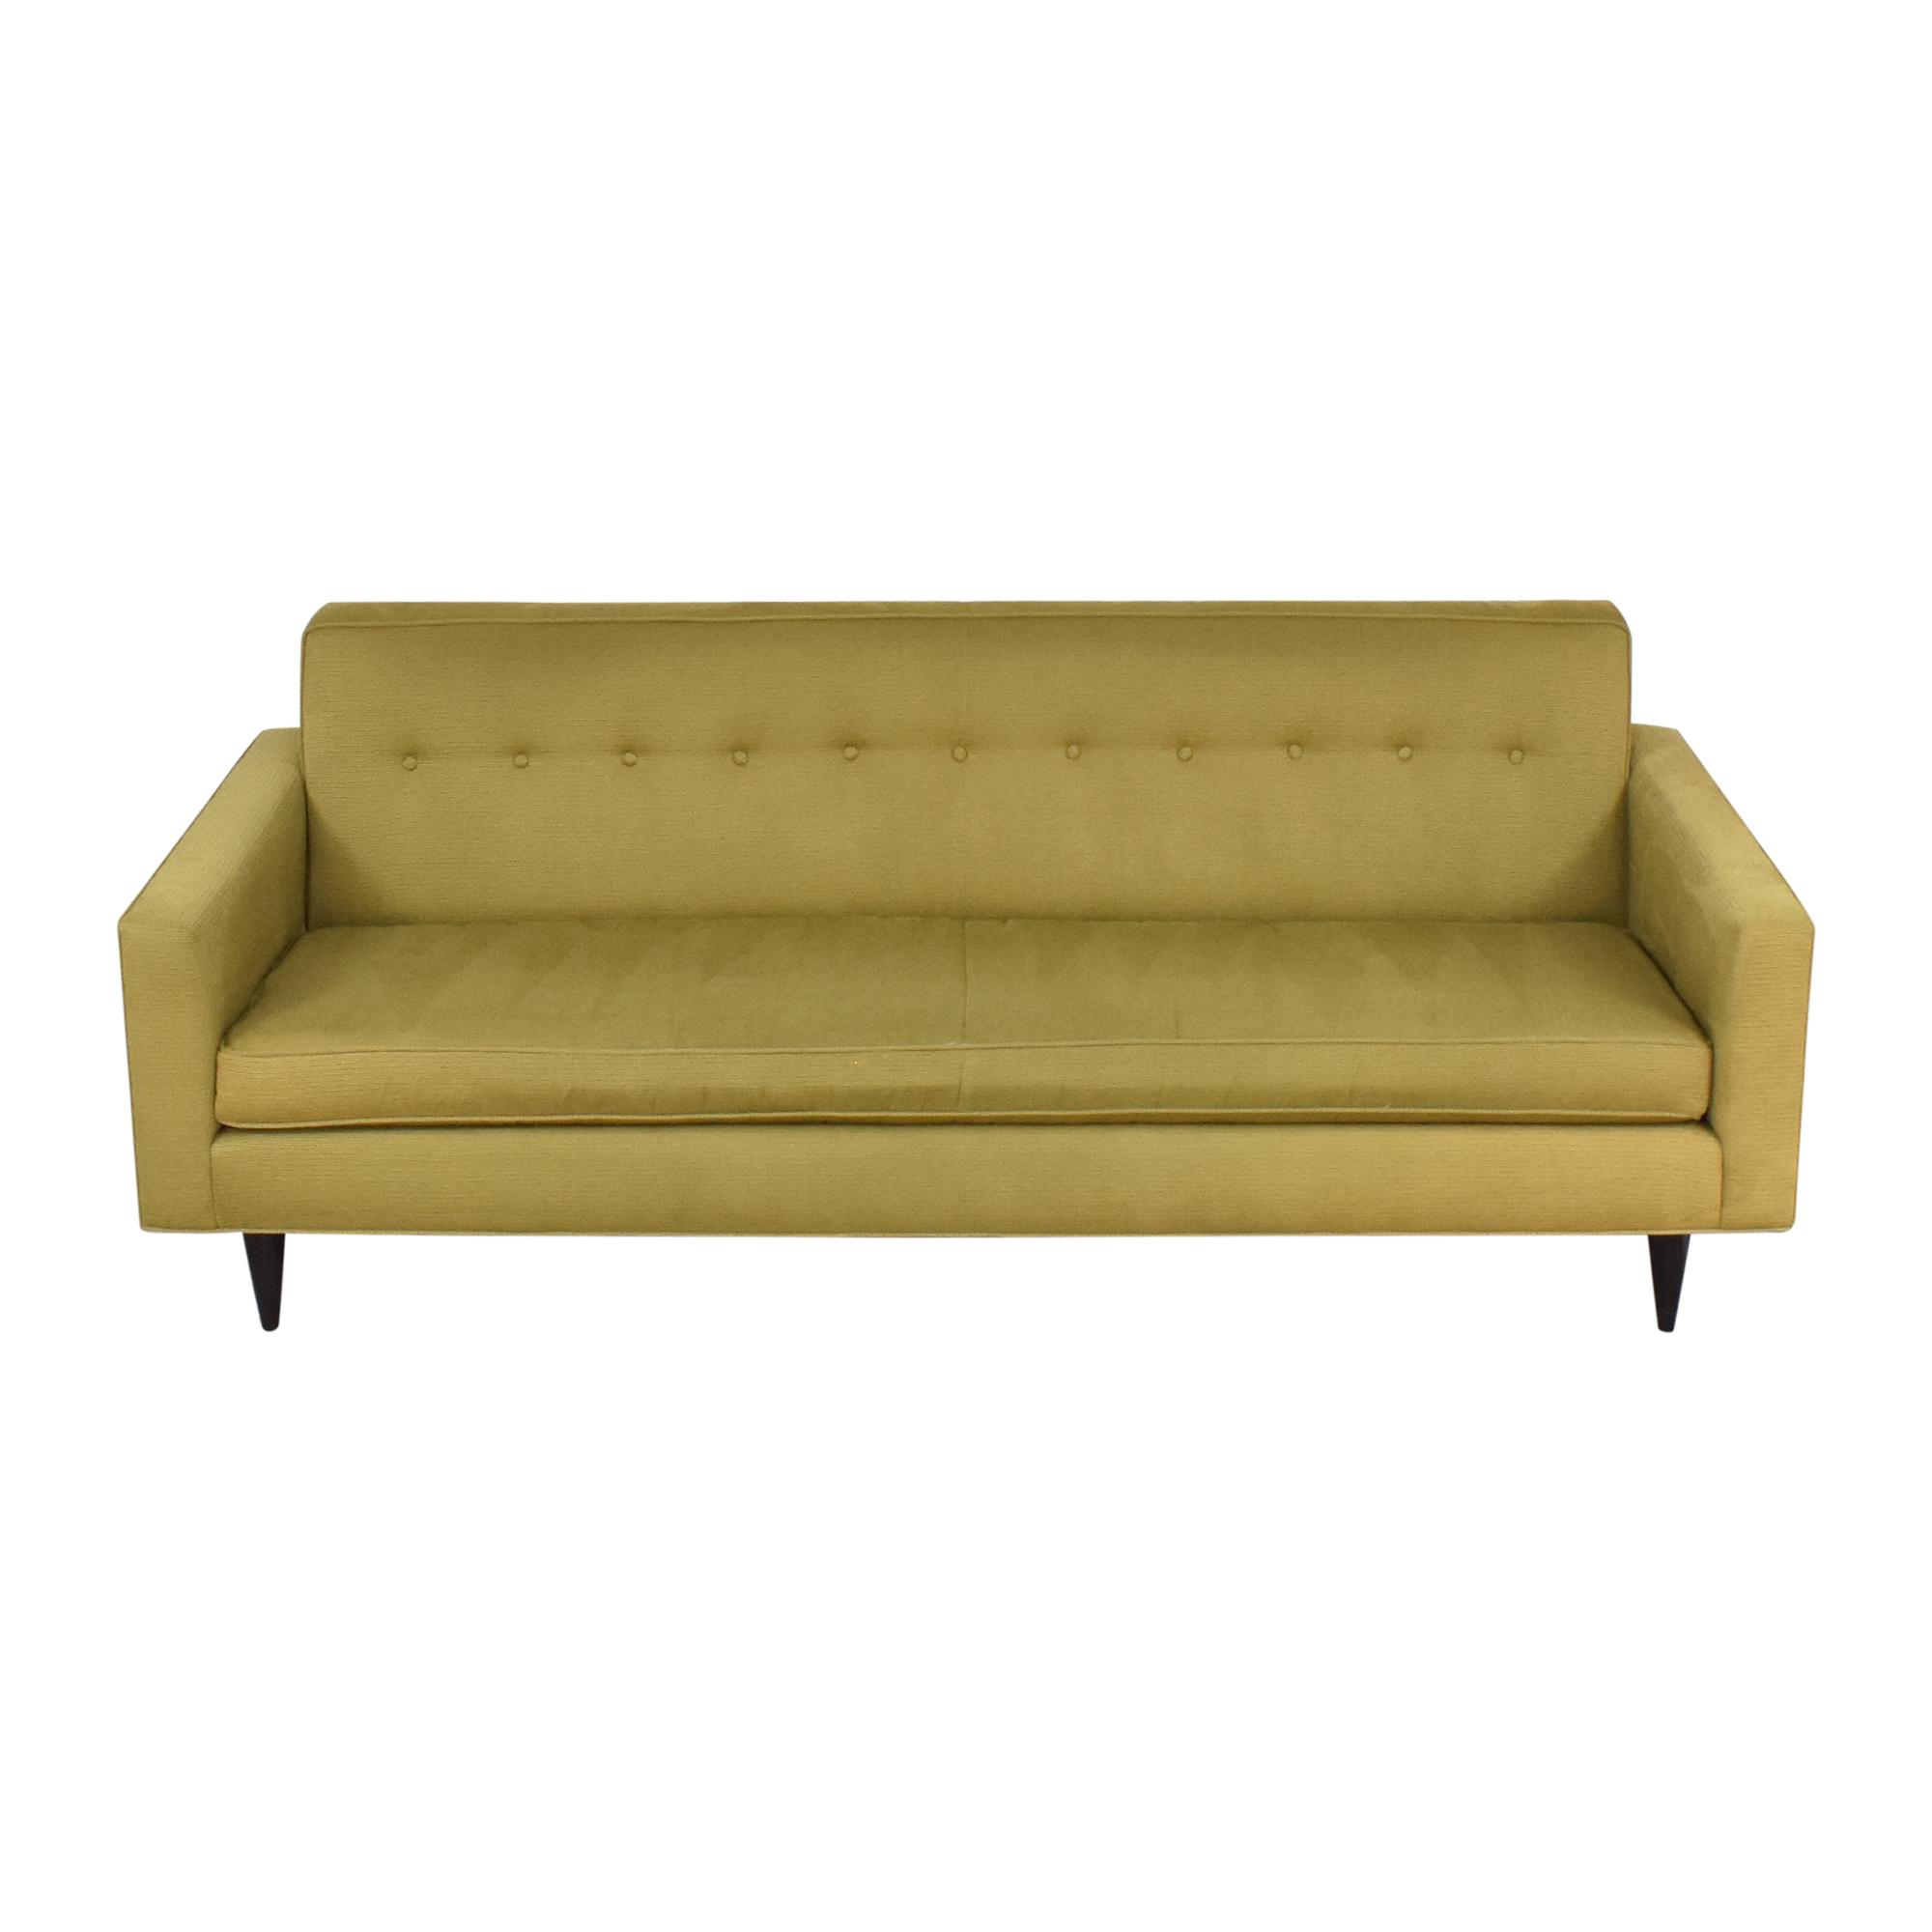 Design Within Reach Design Within Reach Bantam Tufted Sofa ma